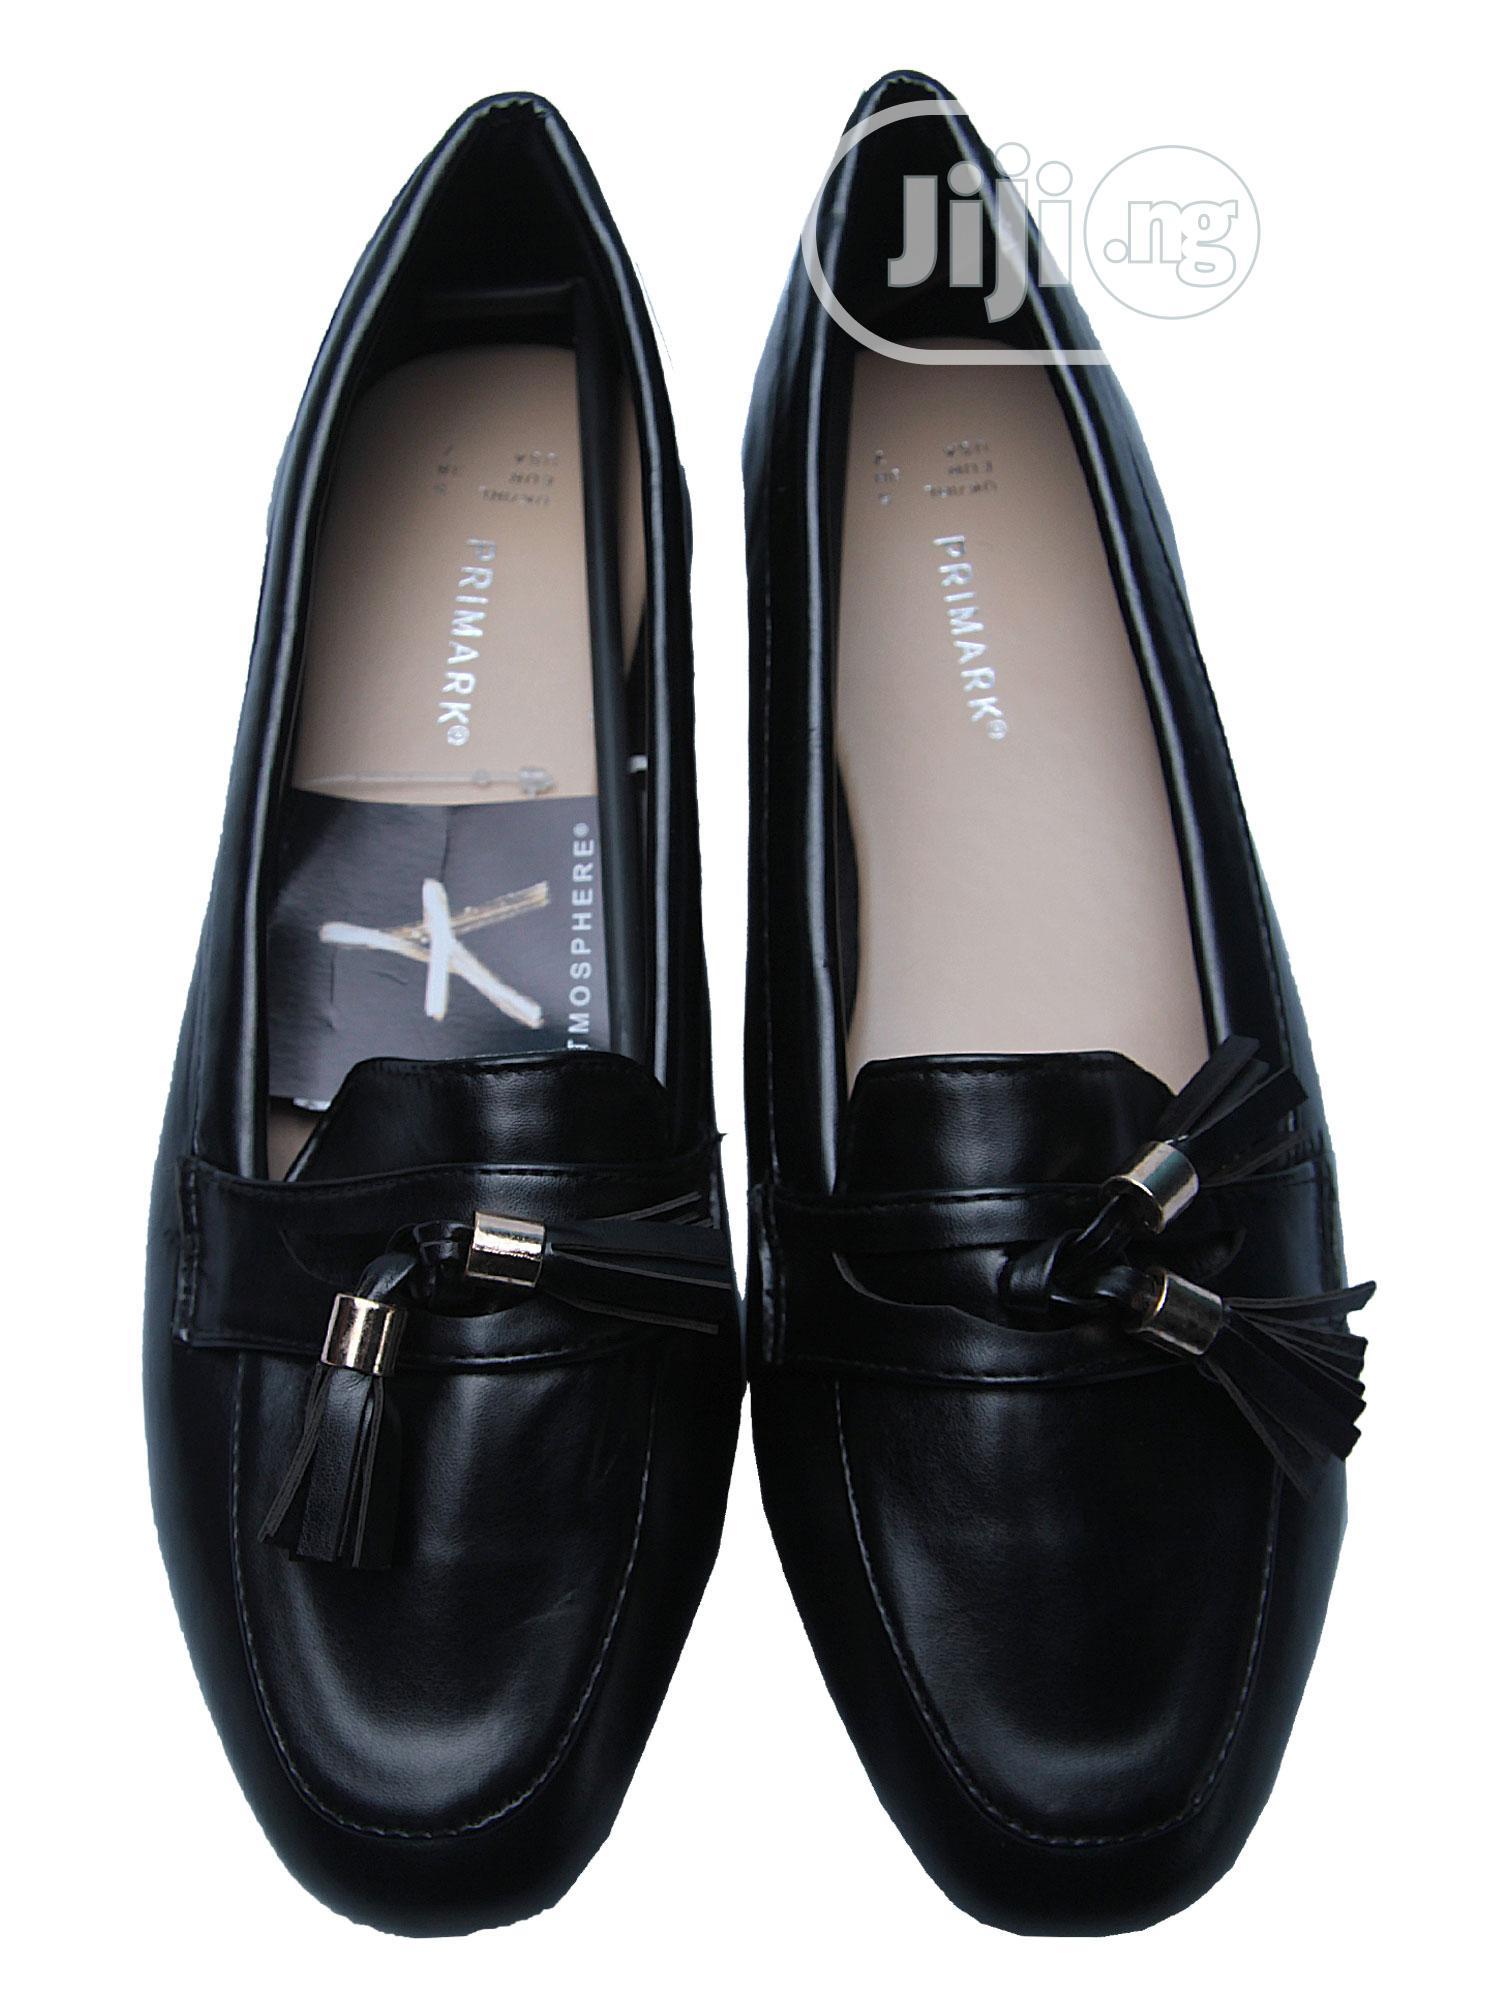 Primark Ladies Flat Black Leather Shoes